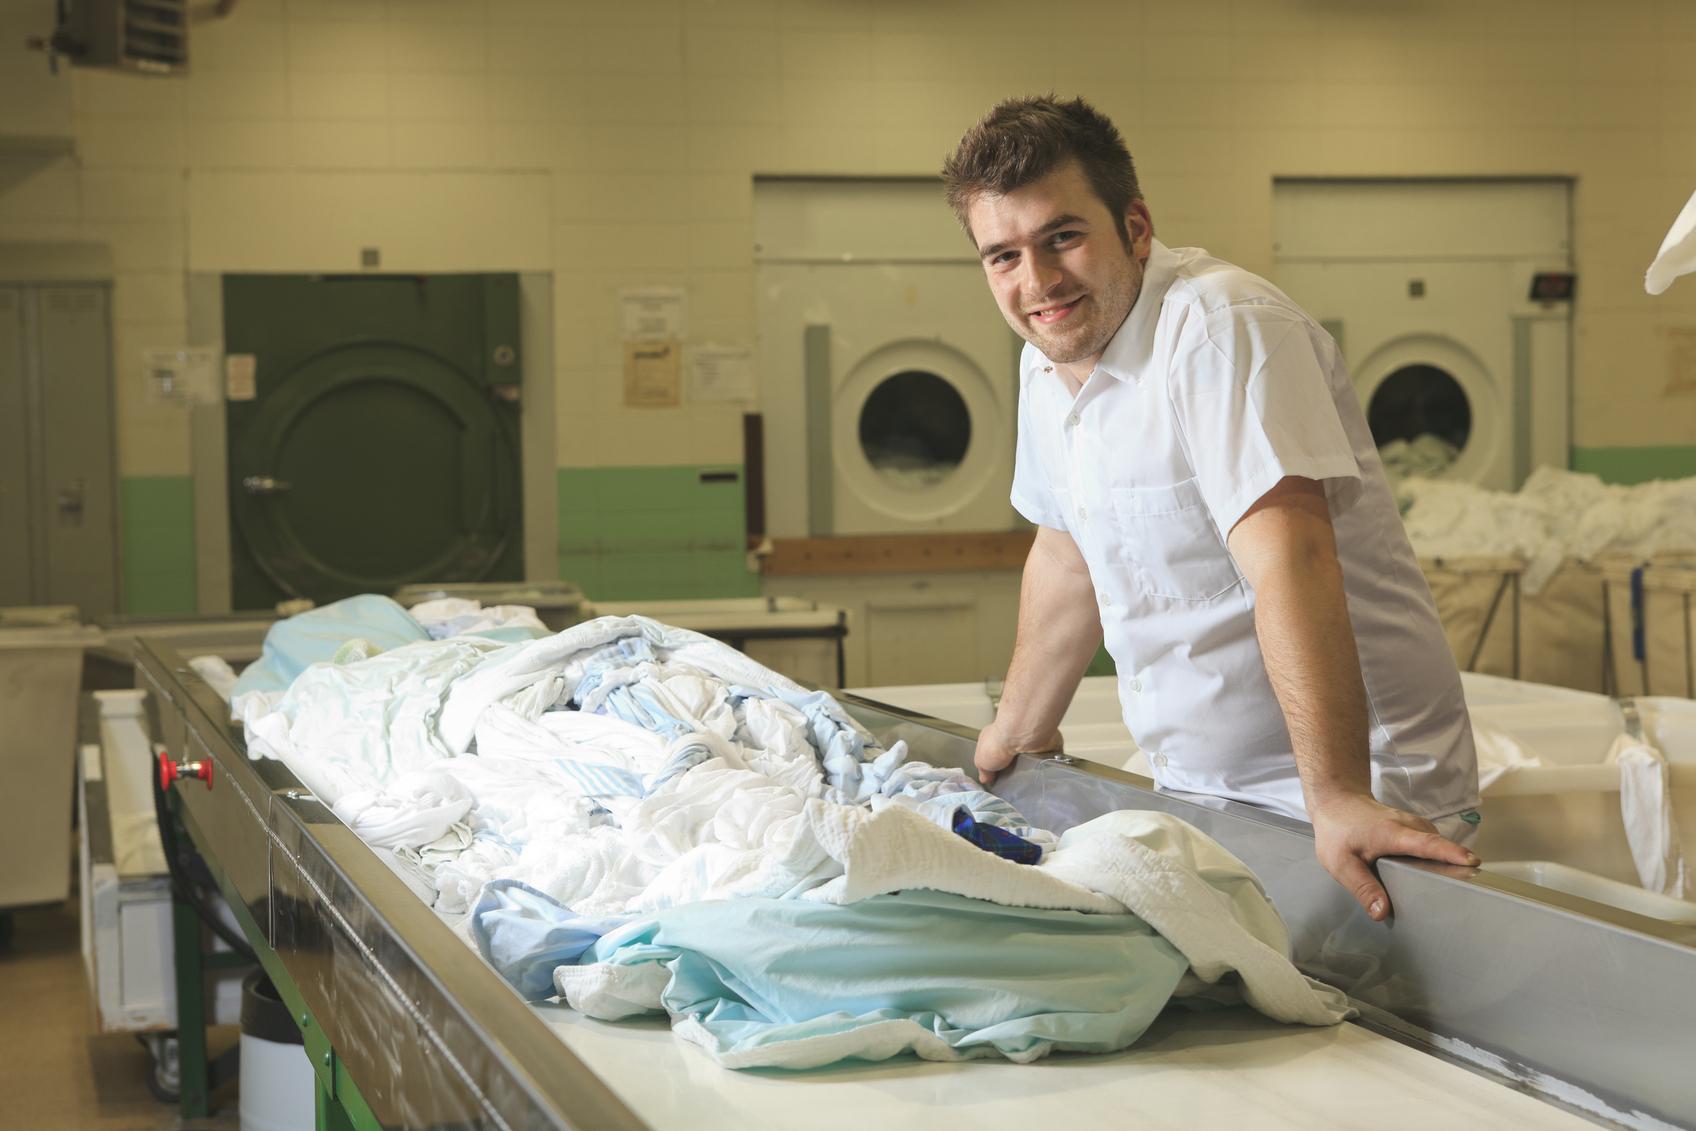 Linen Service Company